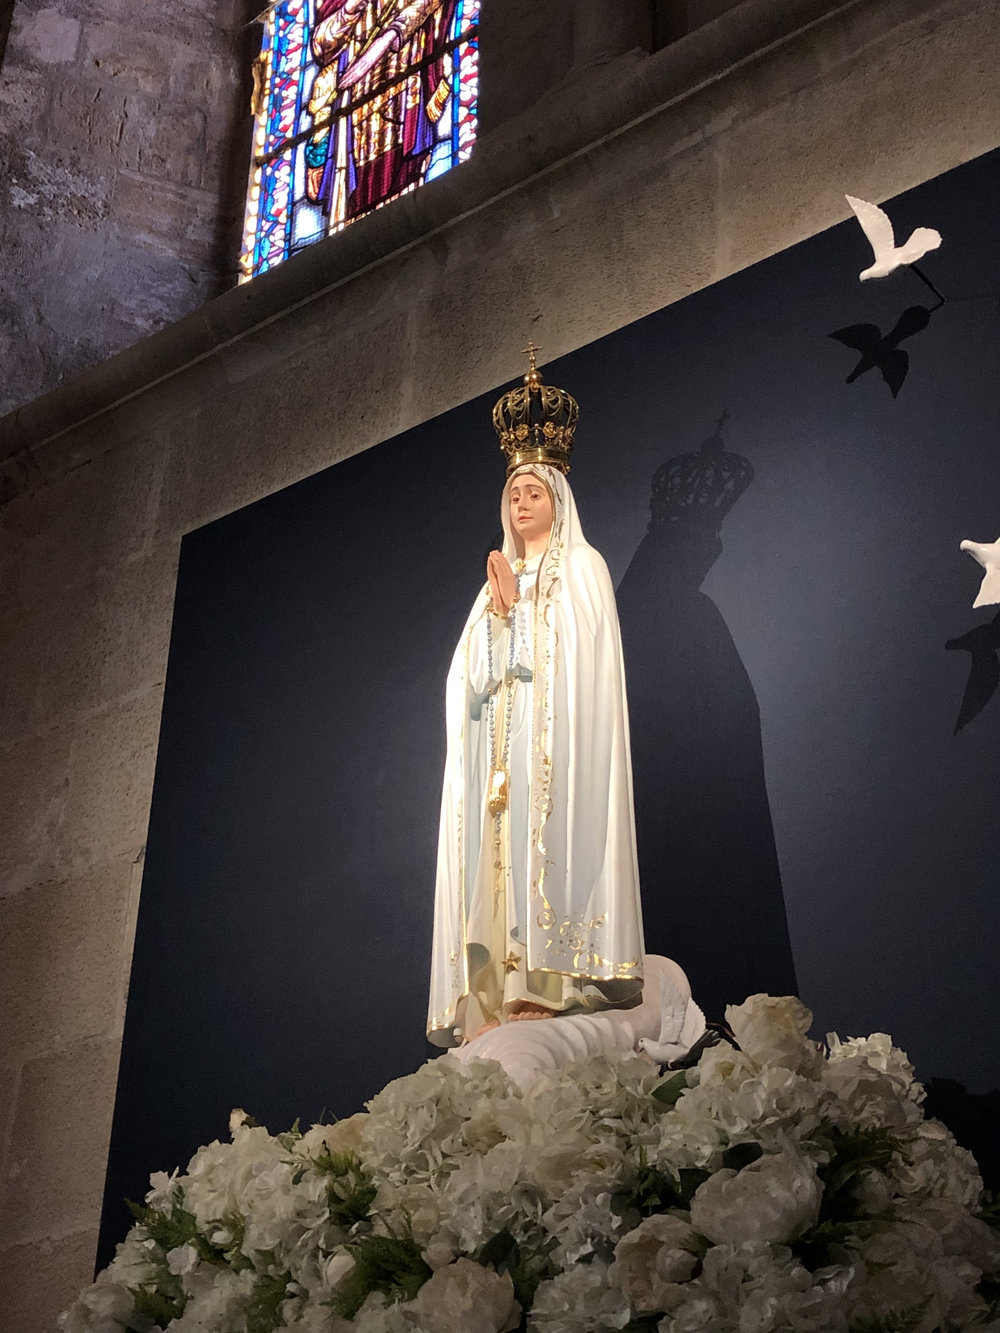 teri_lisbon_portugal_cathedral_spiritedtable_photo10.jpg